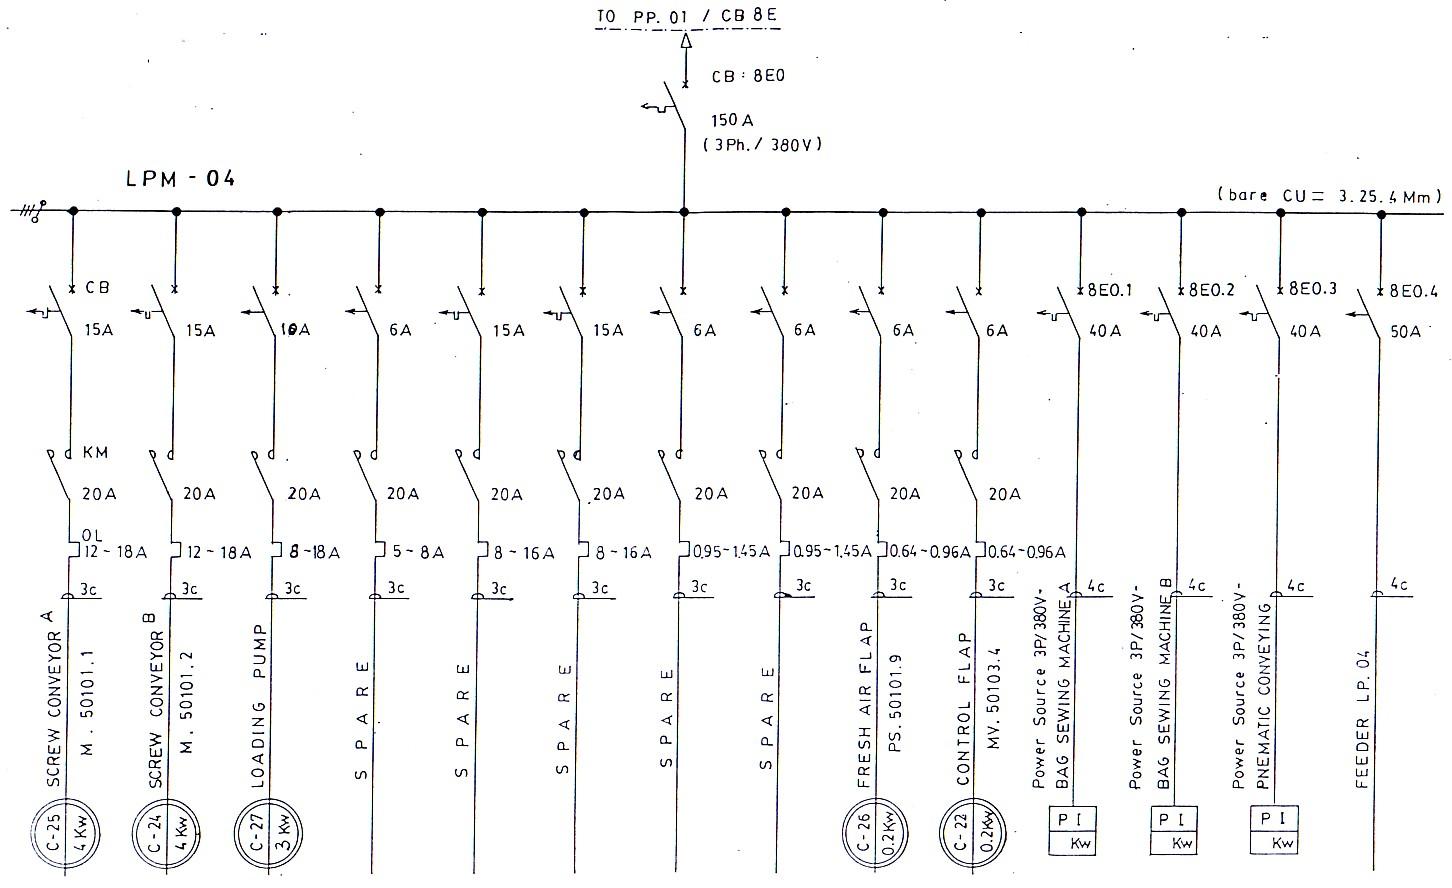 Wiring Diagram Instalasi Listrik : Electrical wiring diagram free download schematic